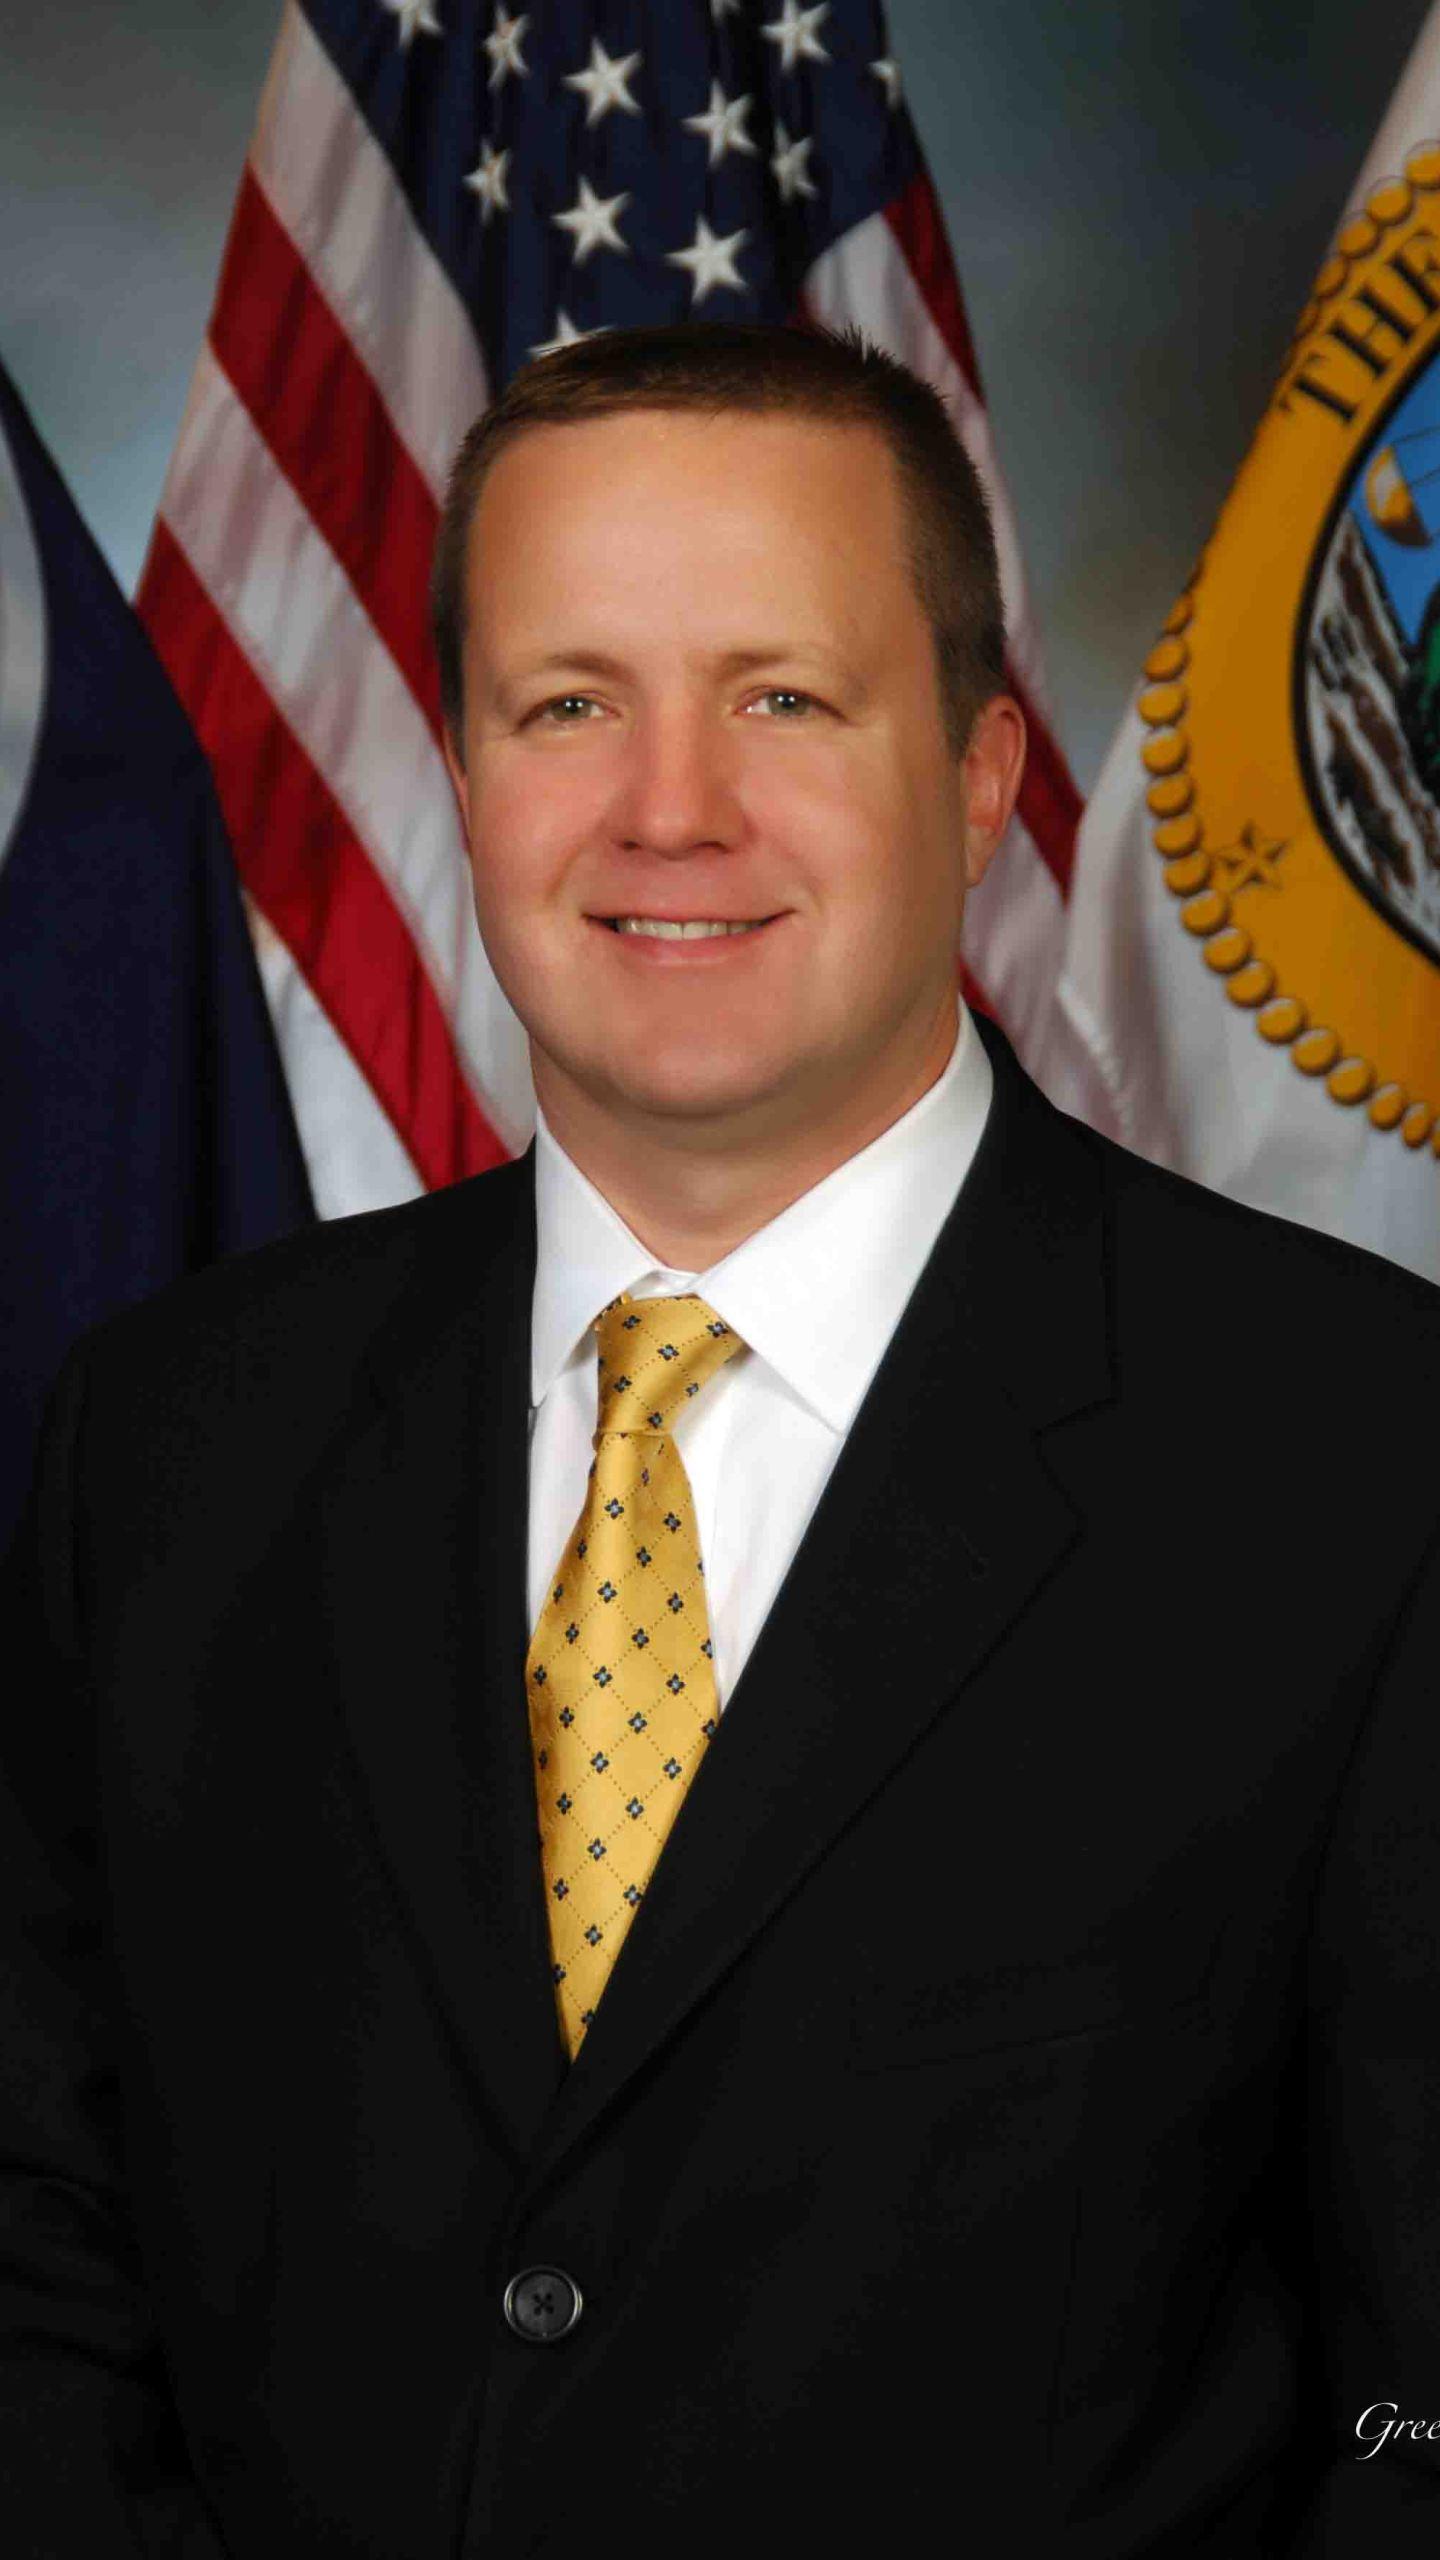 2012 Official Portrait Chairman Stewart_1538493482753.jpg.jpg